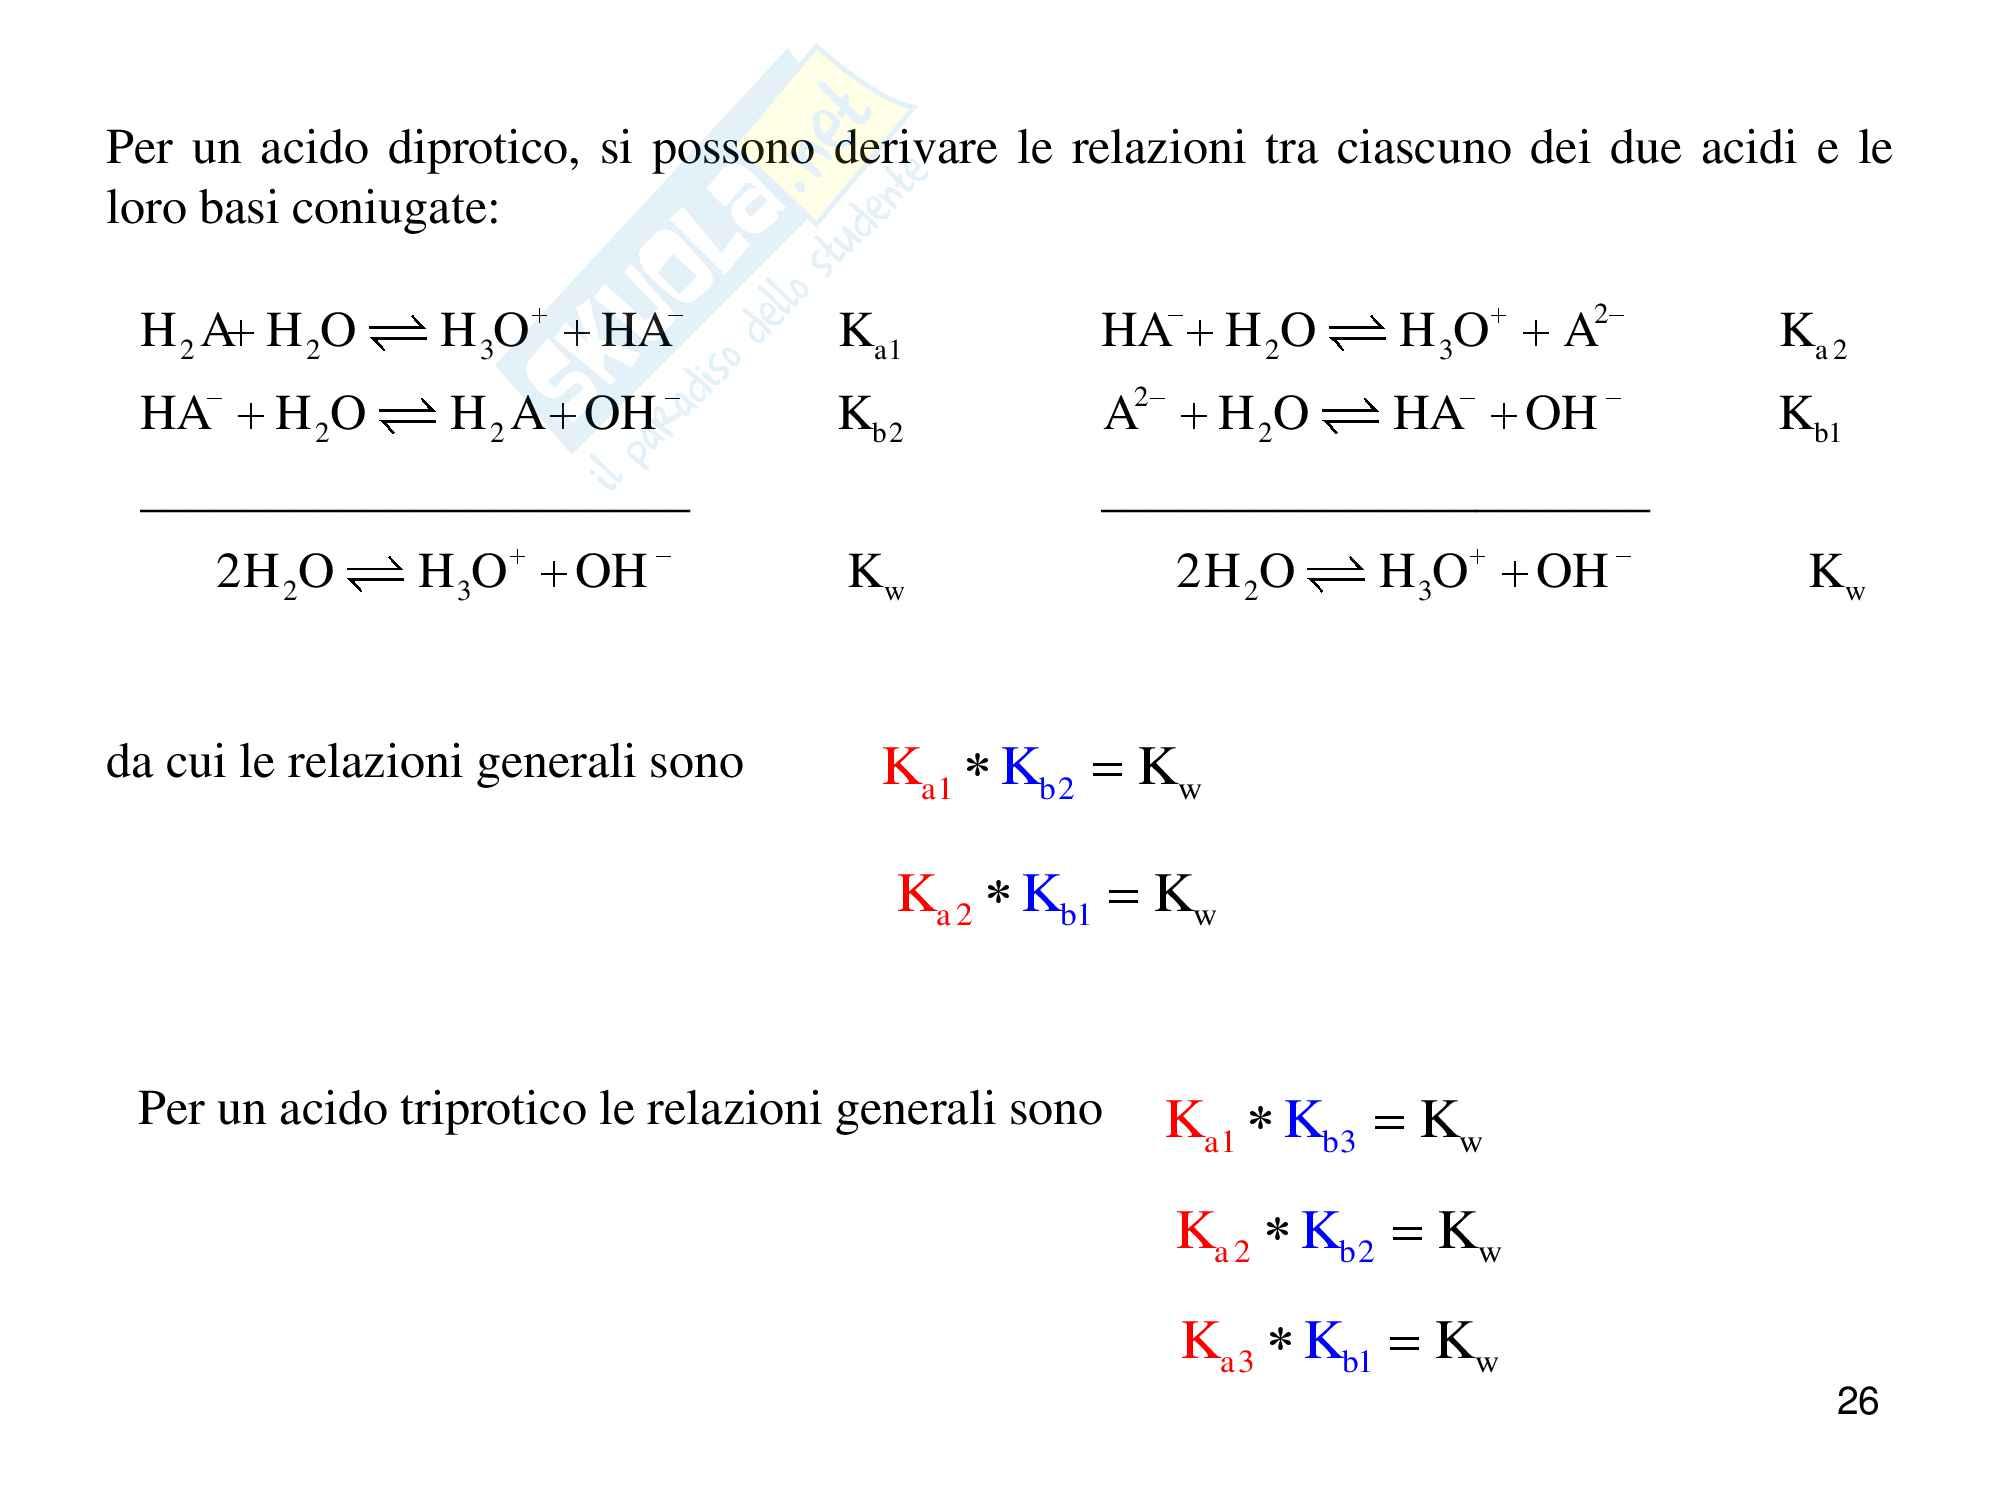 Chimica analitica, equilibrio acido base Pag. 26